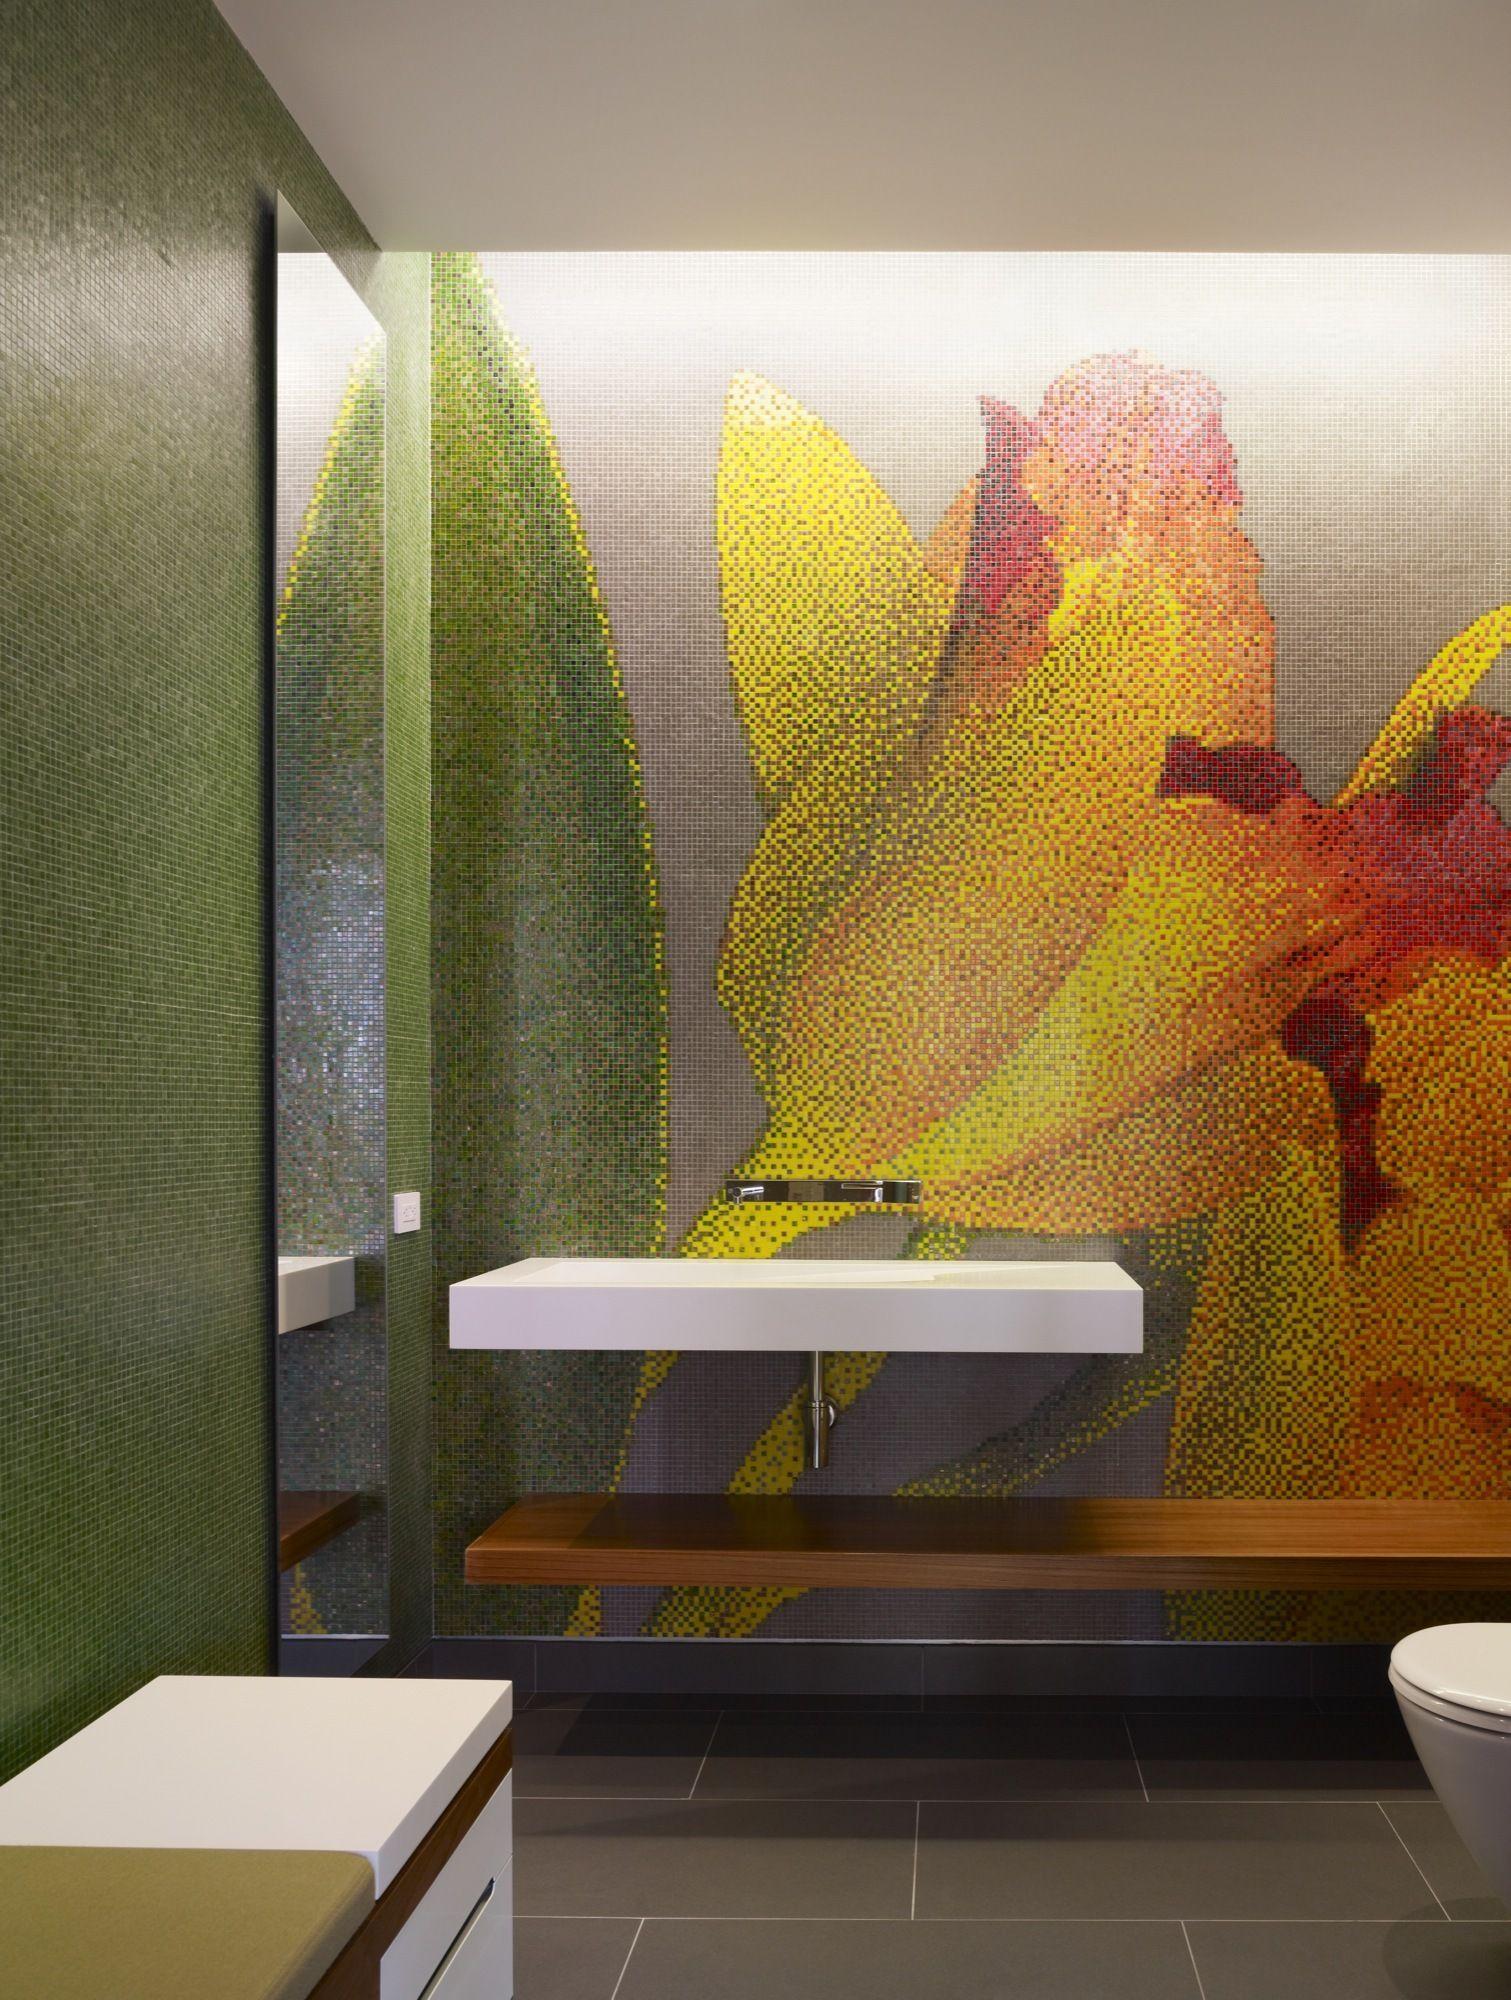 Fleur Pour Salle De Bain ~ bathroom mosaic tiles hawai flower residence kona belzberg